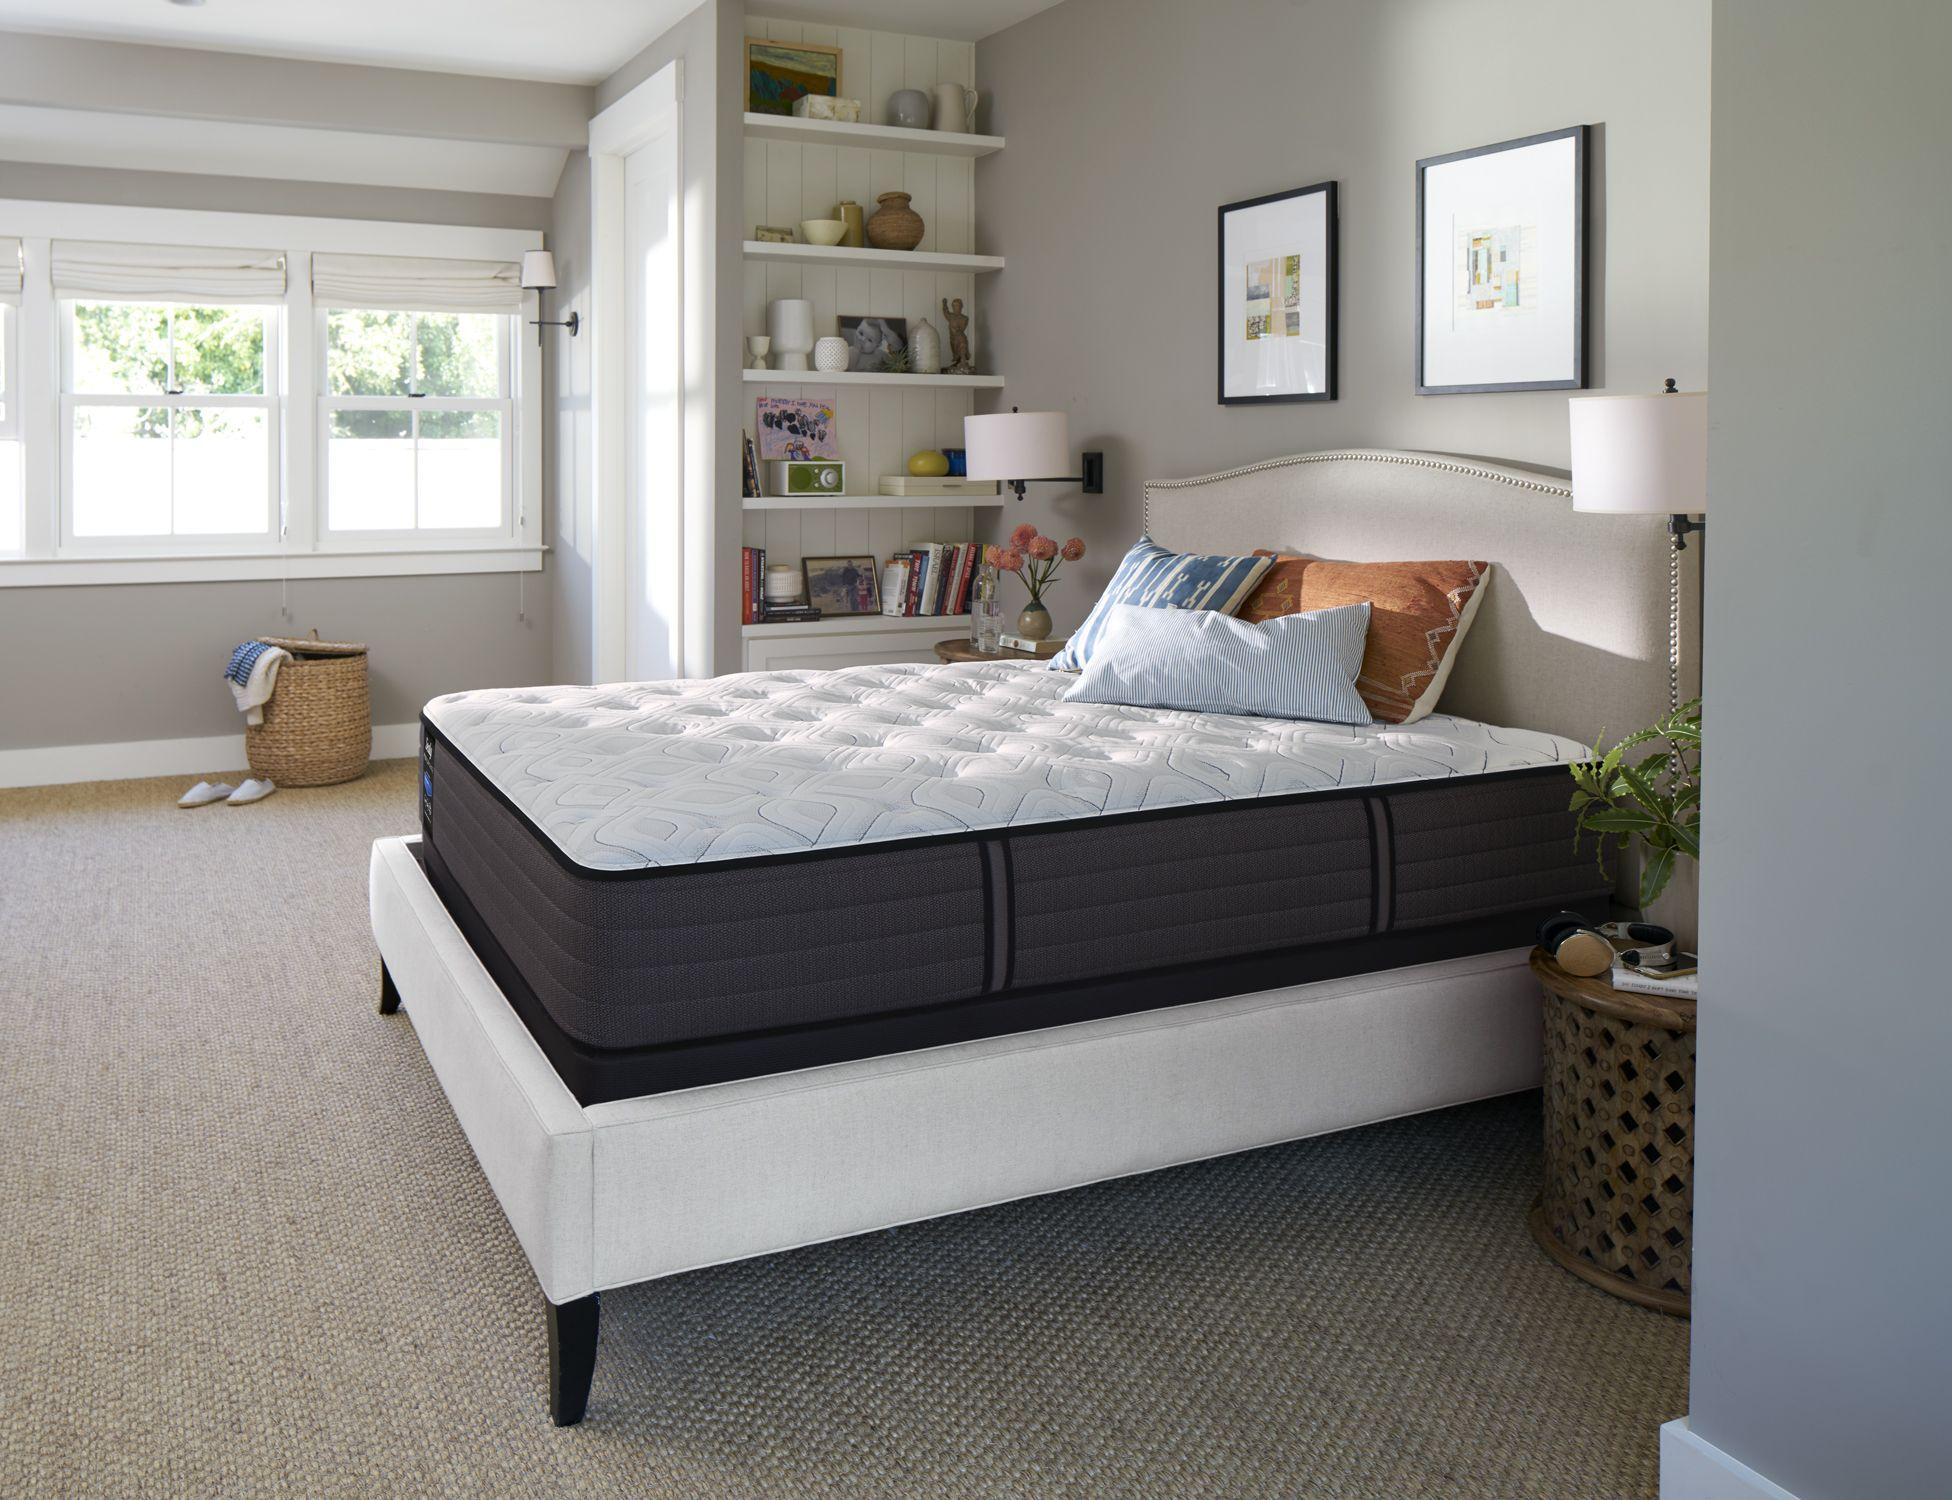 Sealy Response Premium West Avenue Cushion Firm Queen Size Mattress